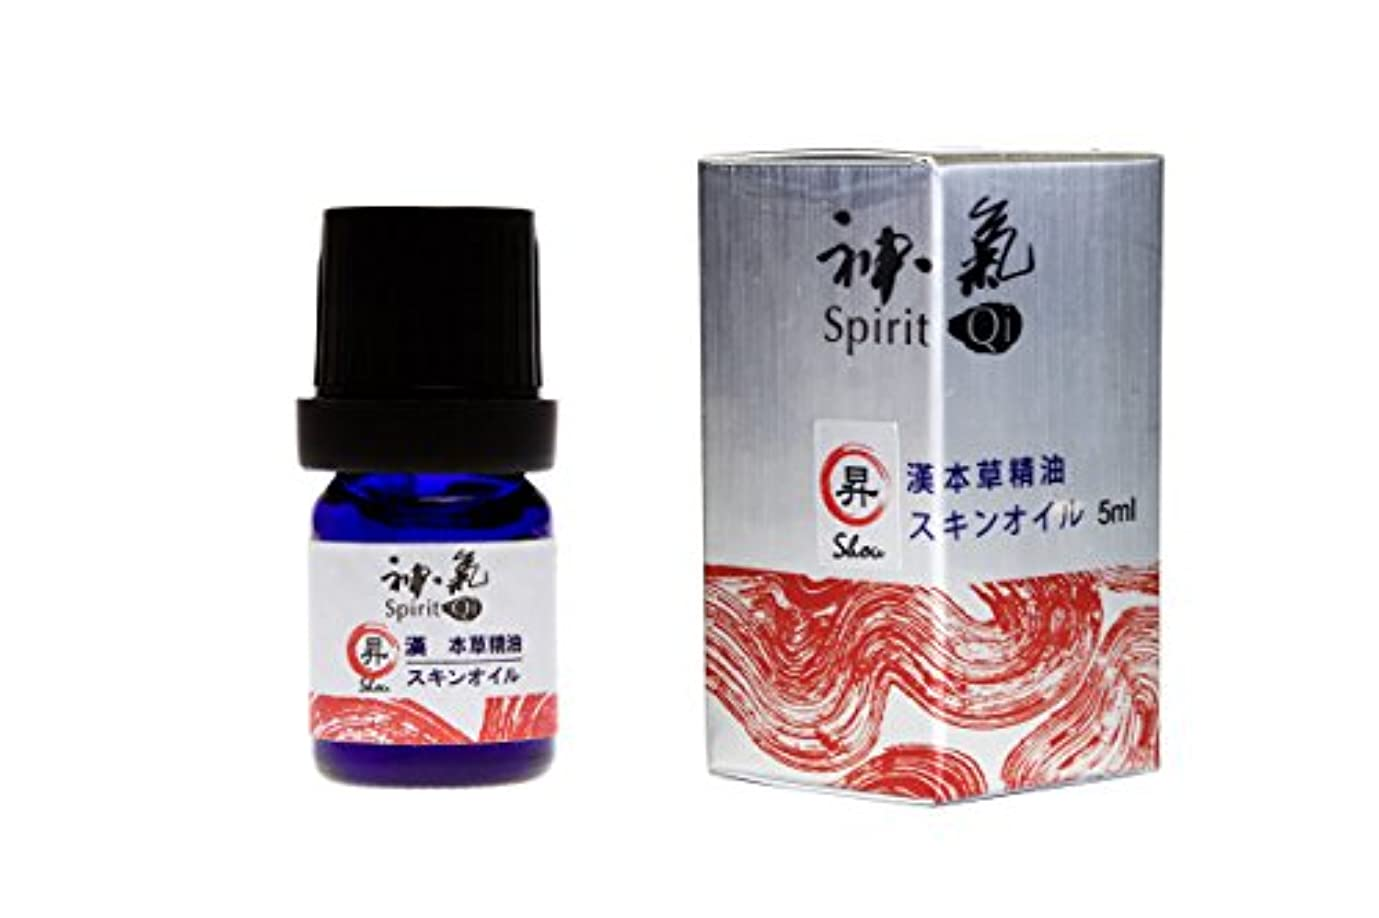 季節融合選ぶ神気症状別シリーズ 昇(Shou) (5ml)